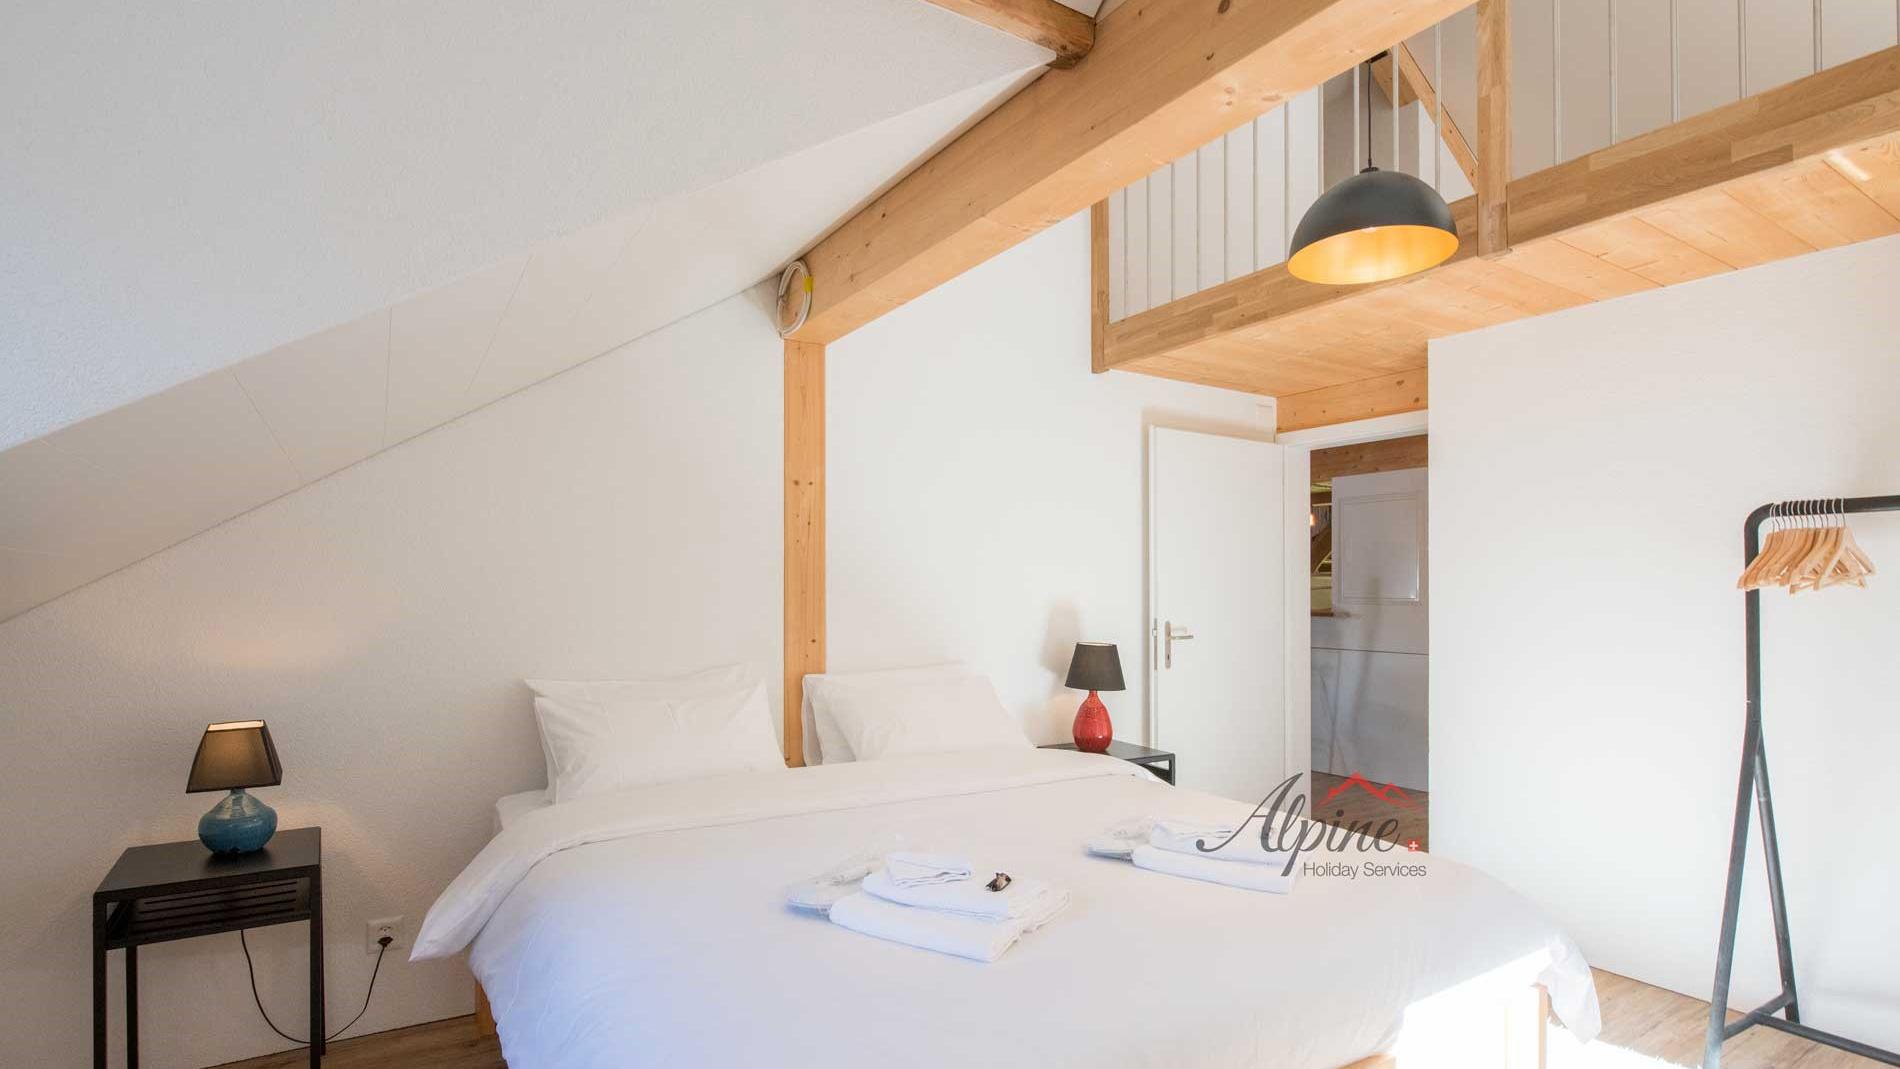 Bertha Apartments, Switzerland